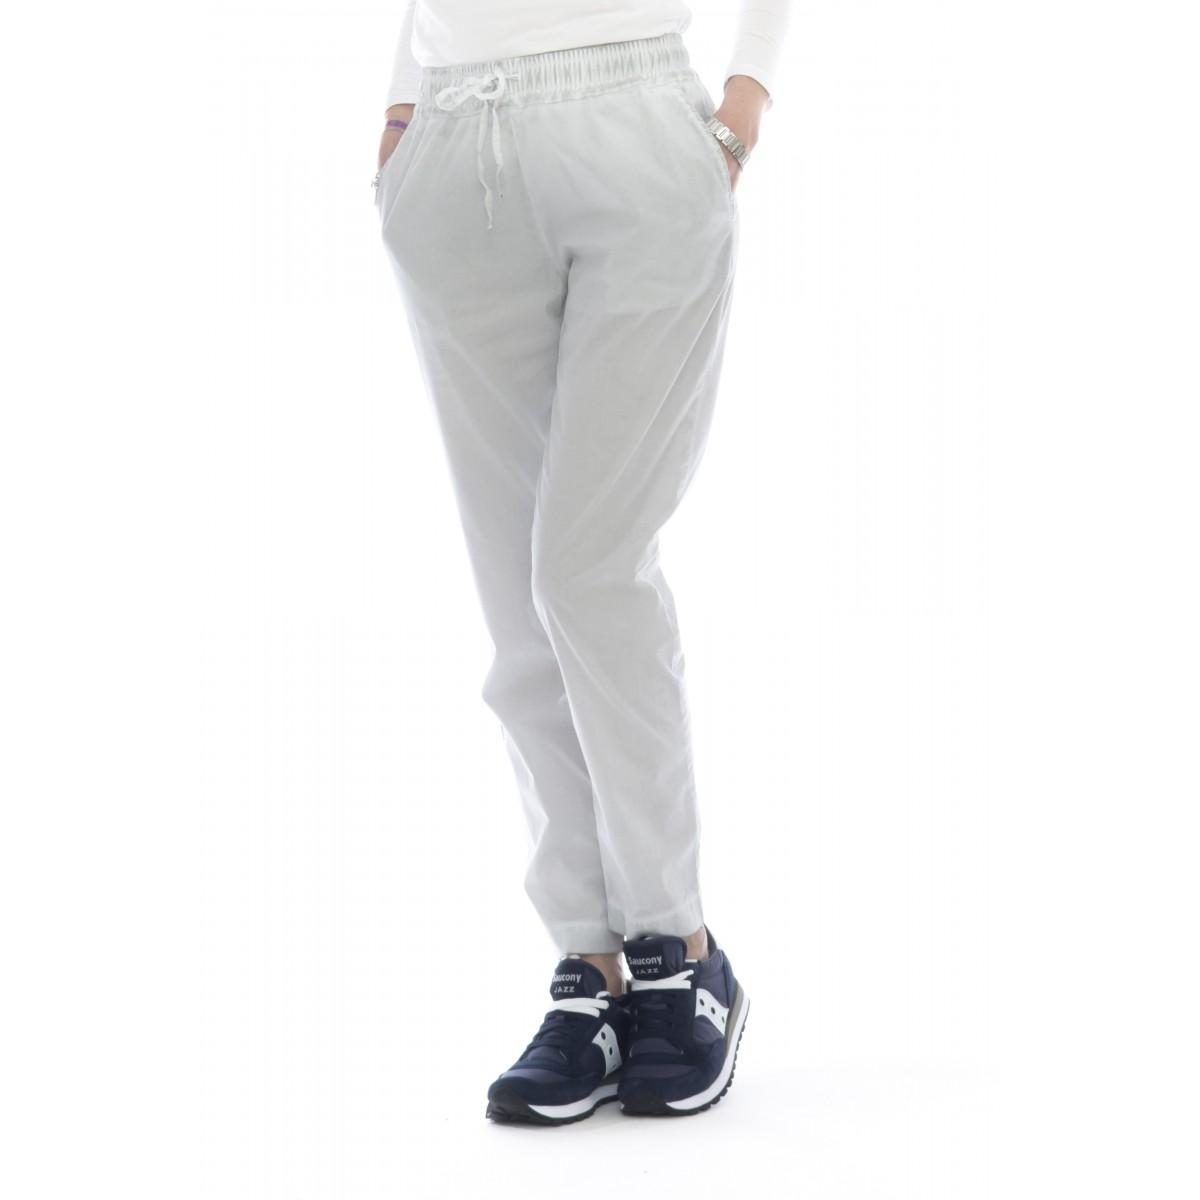 Pantalone donna - 5101/01f pantalone popline strech lavato freddo